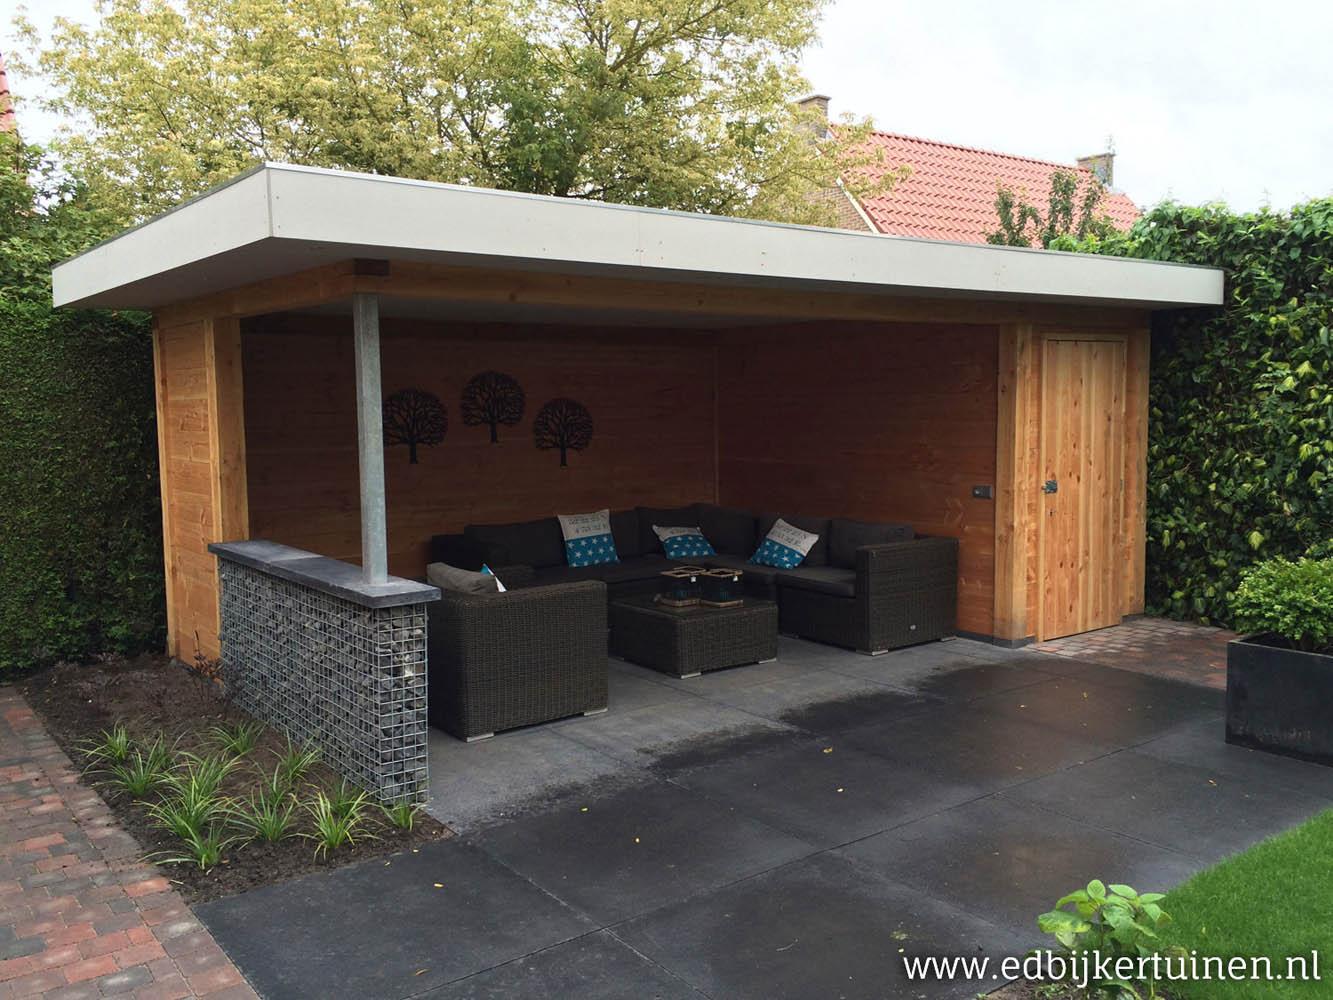 Overkapping Kleine Tuin : Bekend overkapping in kleine tuin lf belbin